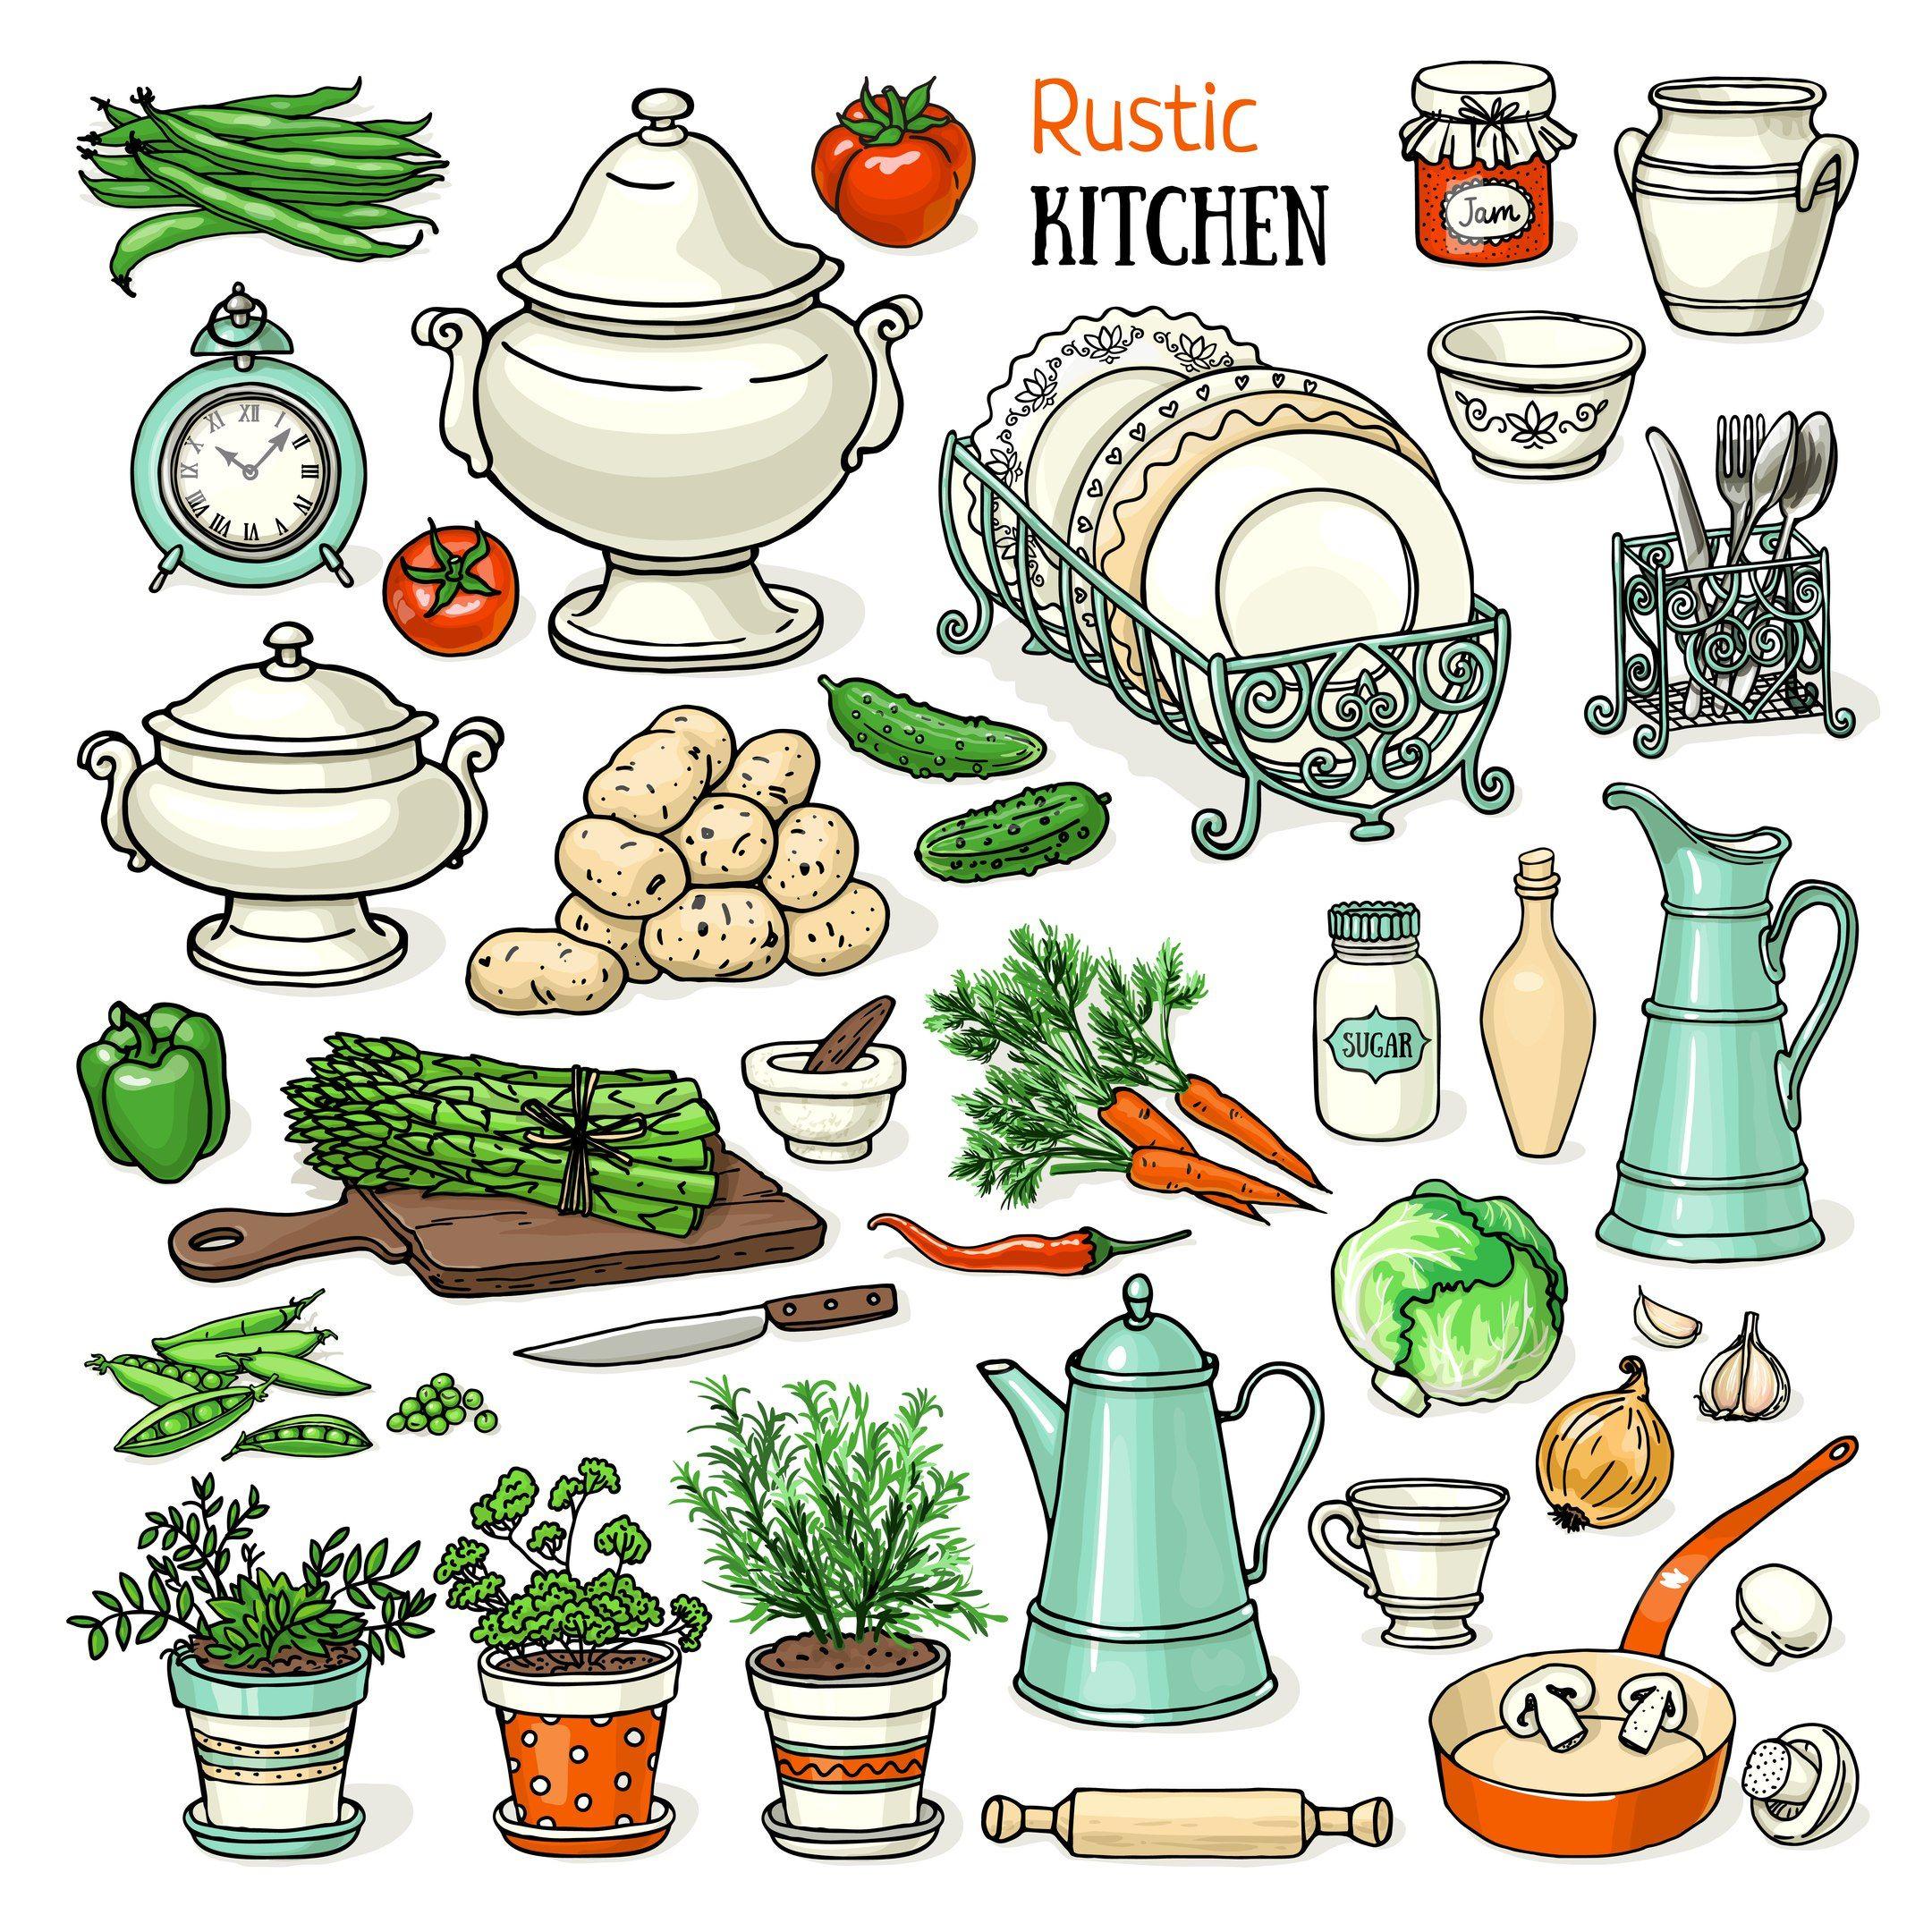 illustration, kitchen, art, printable, rustic kitchen, home, food ...